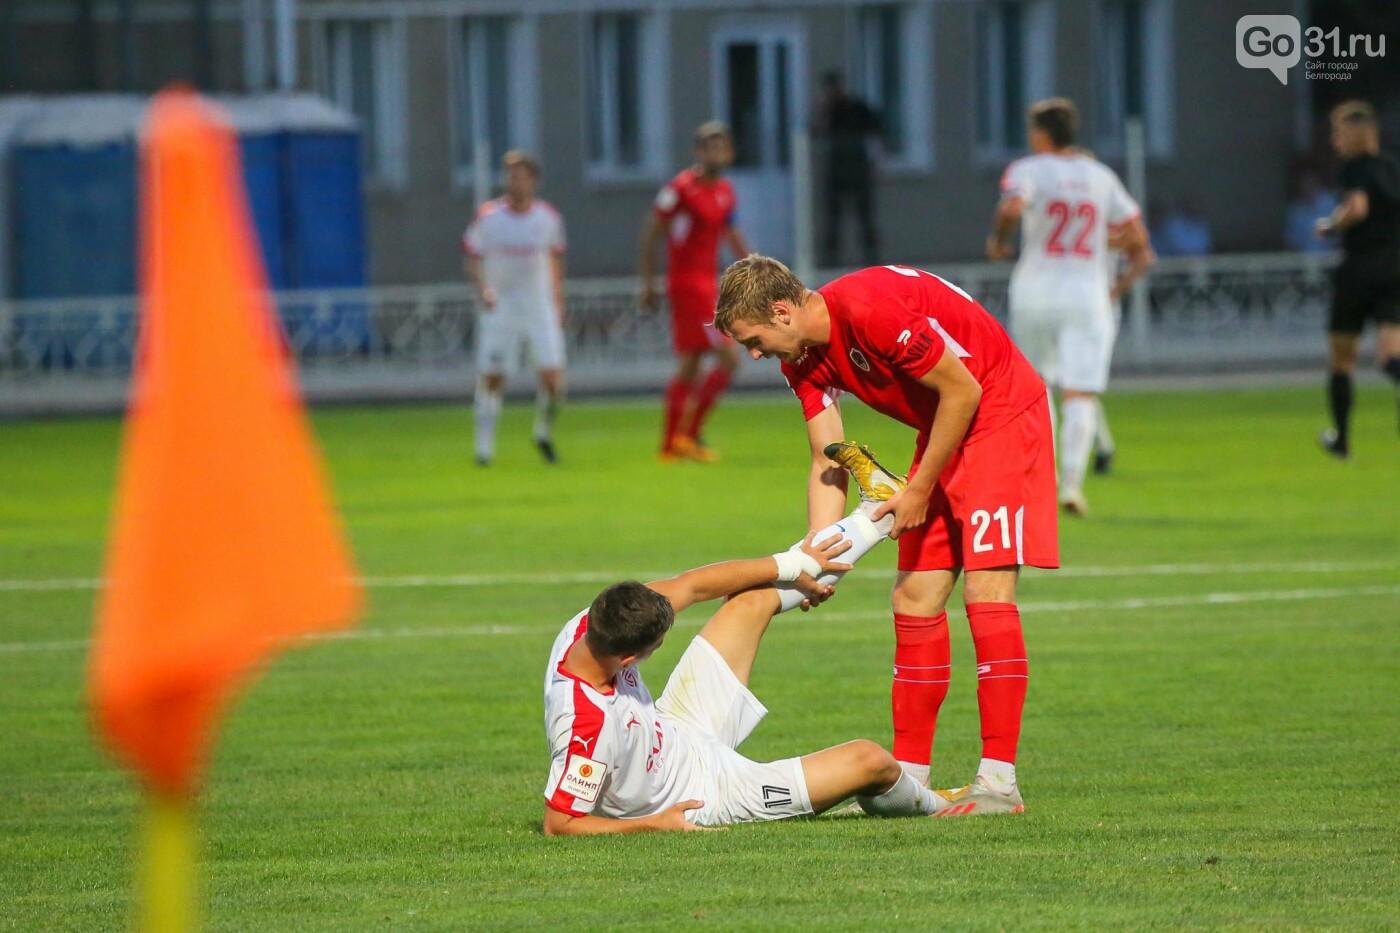 «Салют Белгород»: третья победа подряд, фото-51, Фото: Антон Вергун